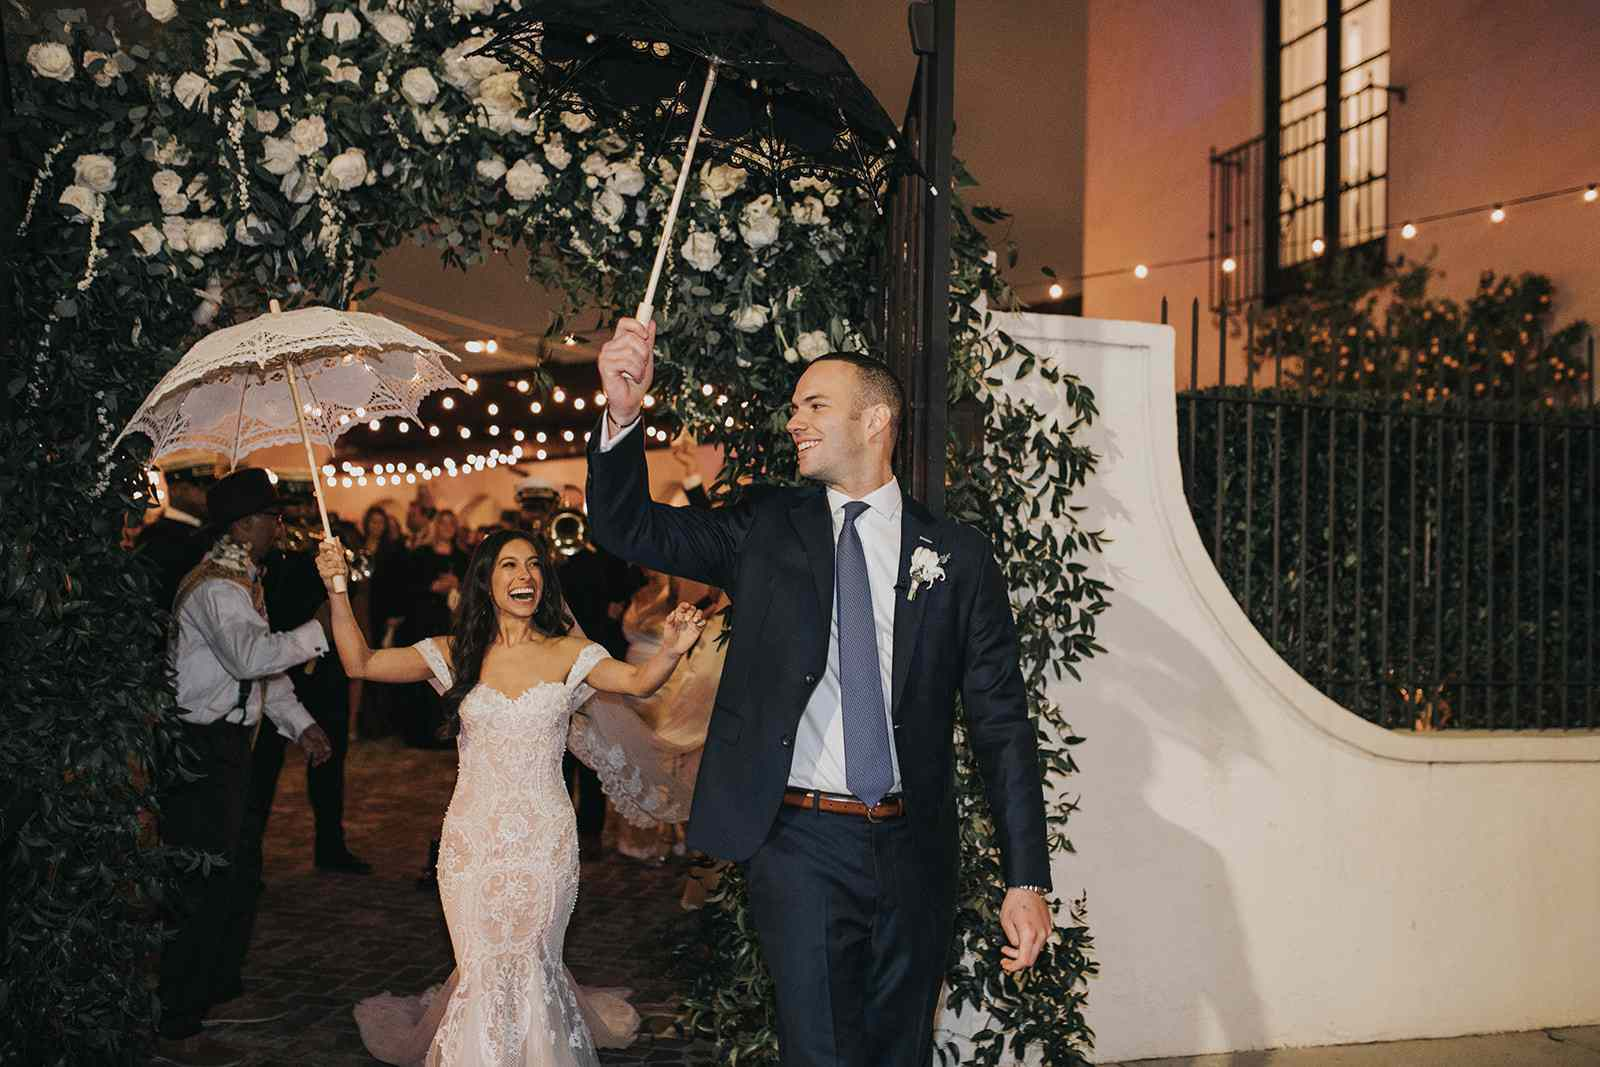 bride and groom holding umbrellas